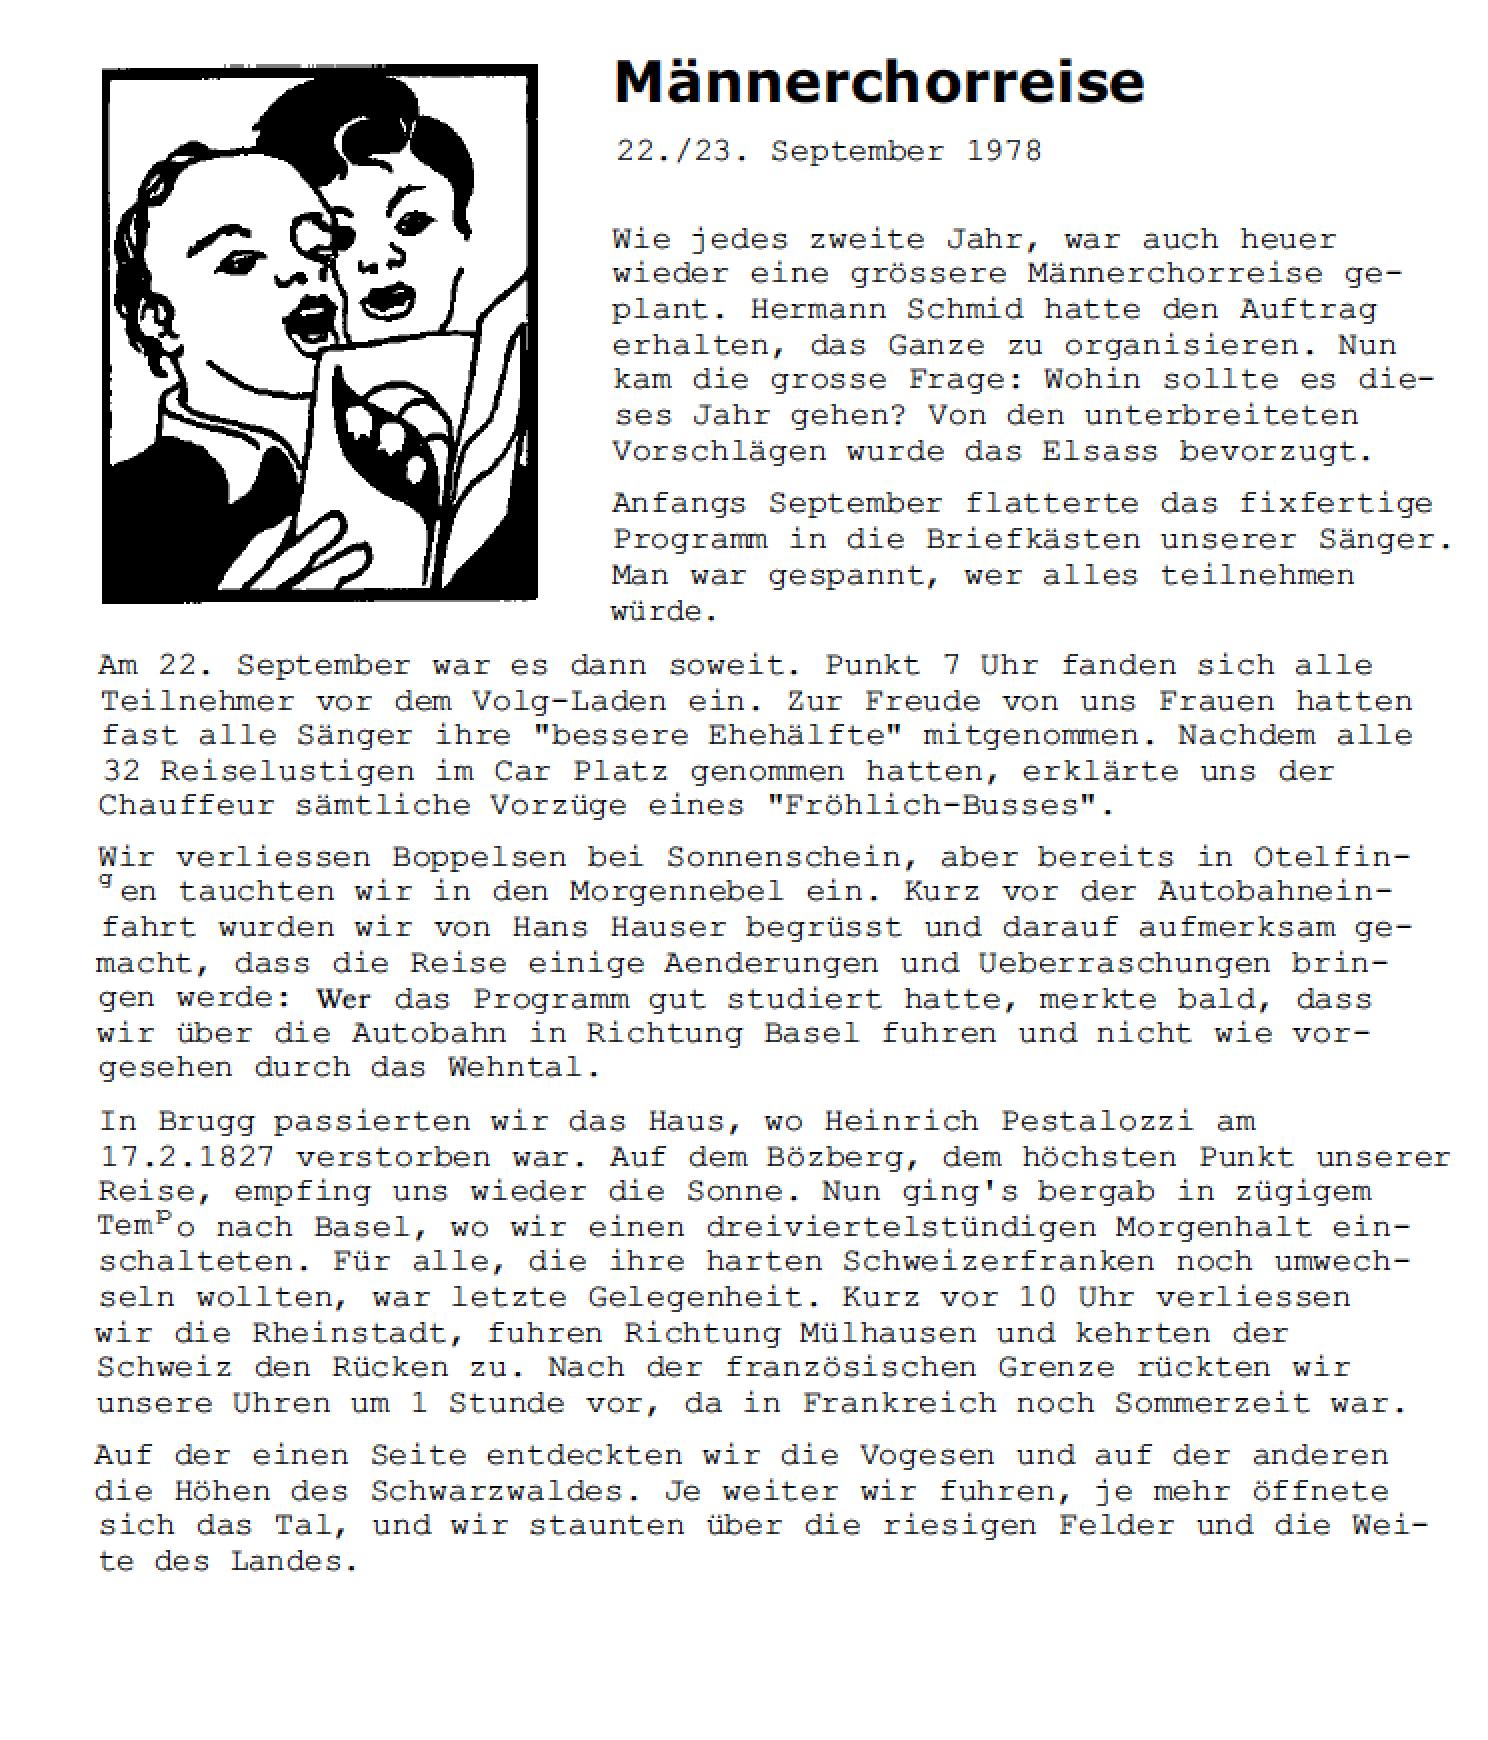 Reisebericht BOZY 4/78